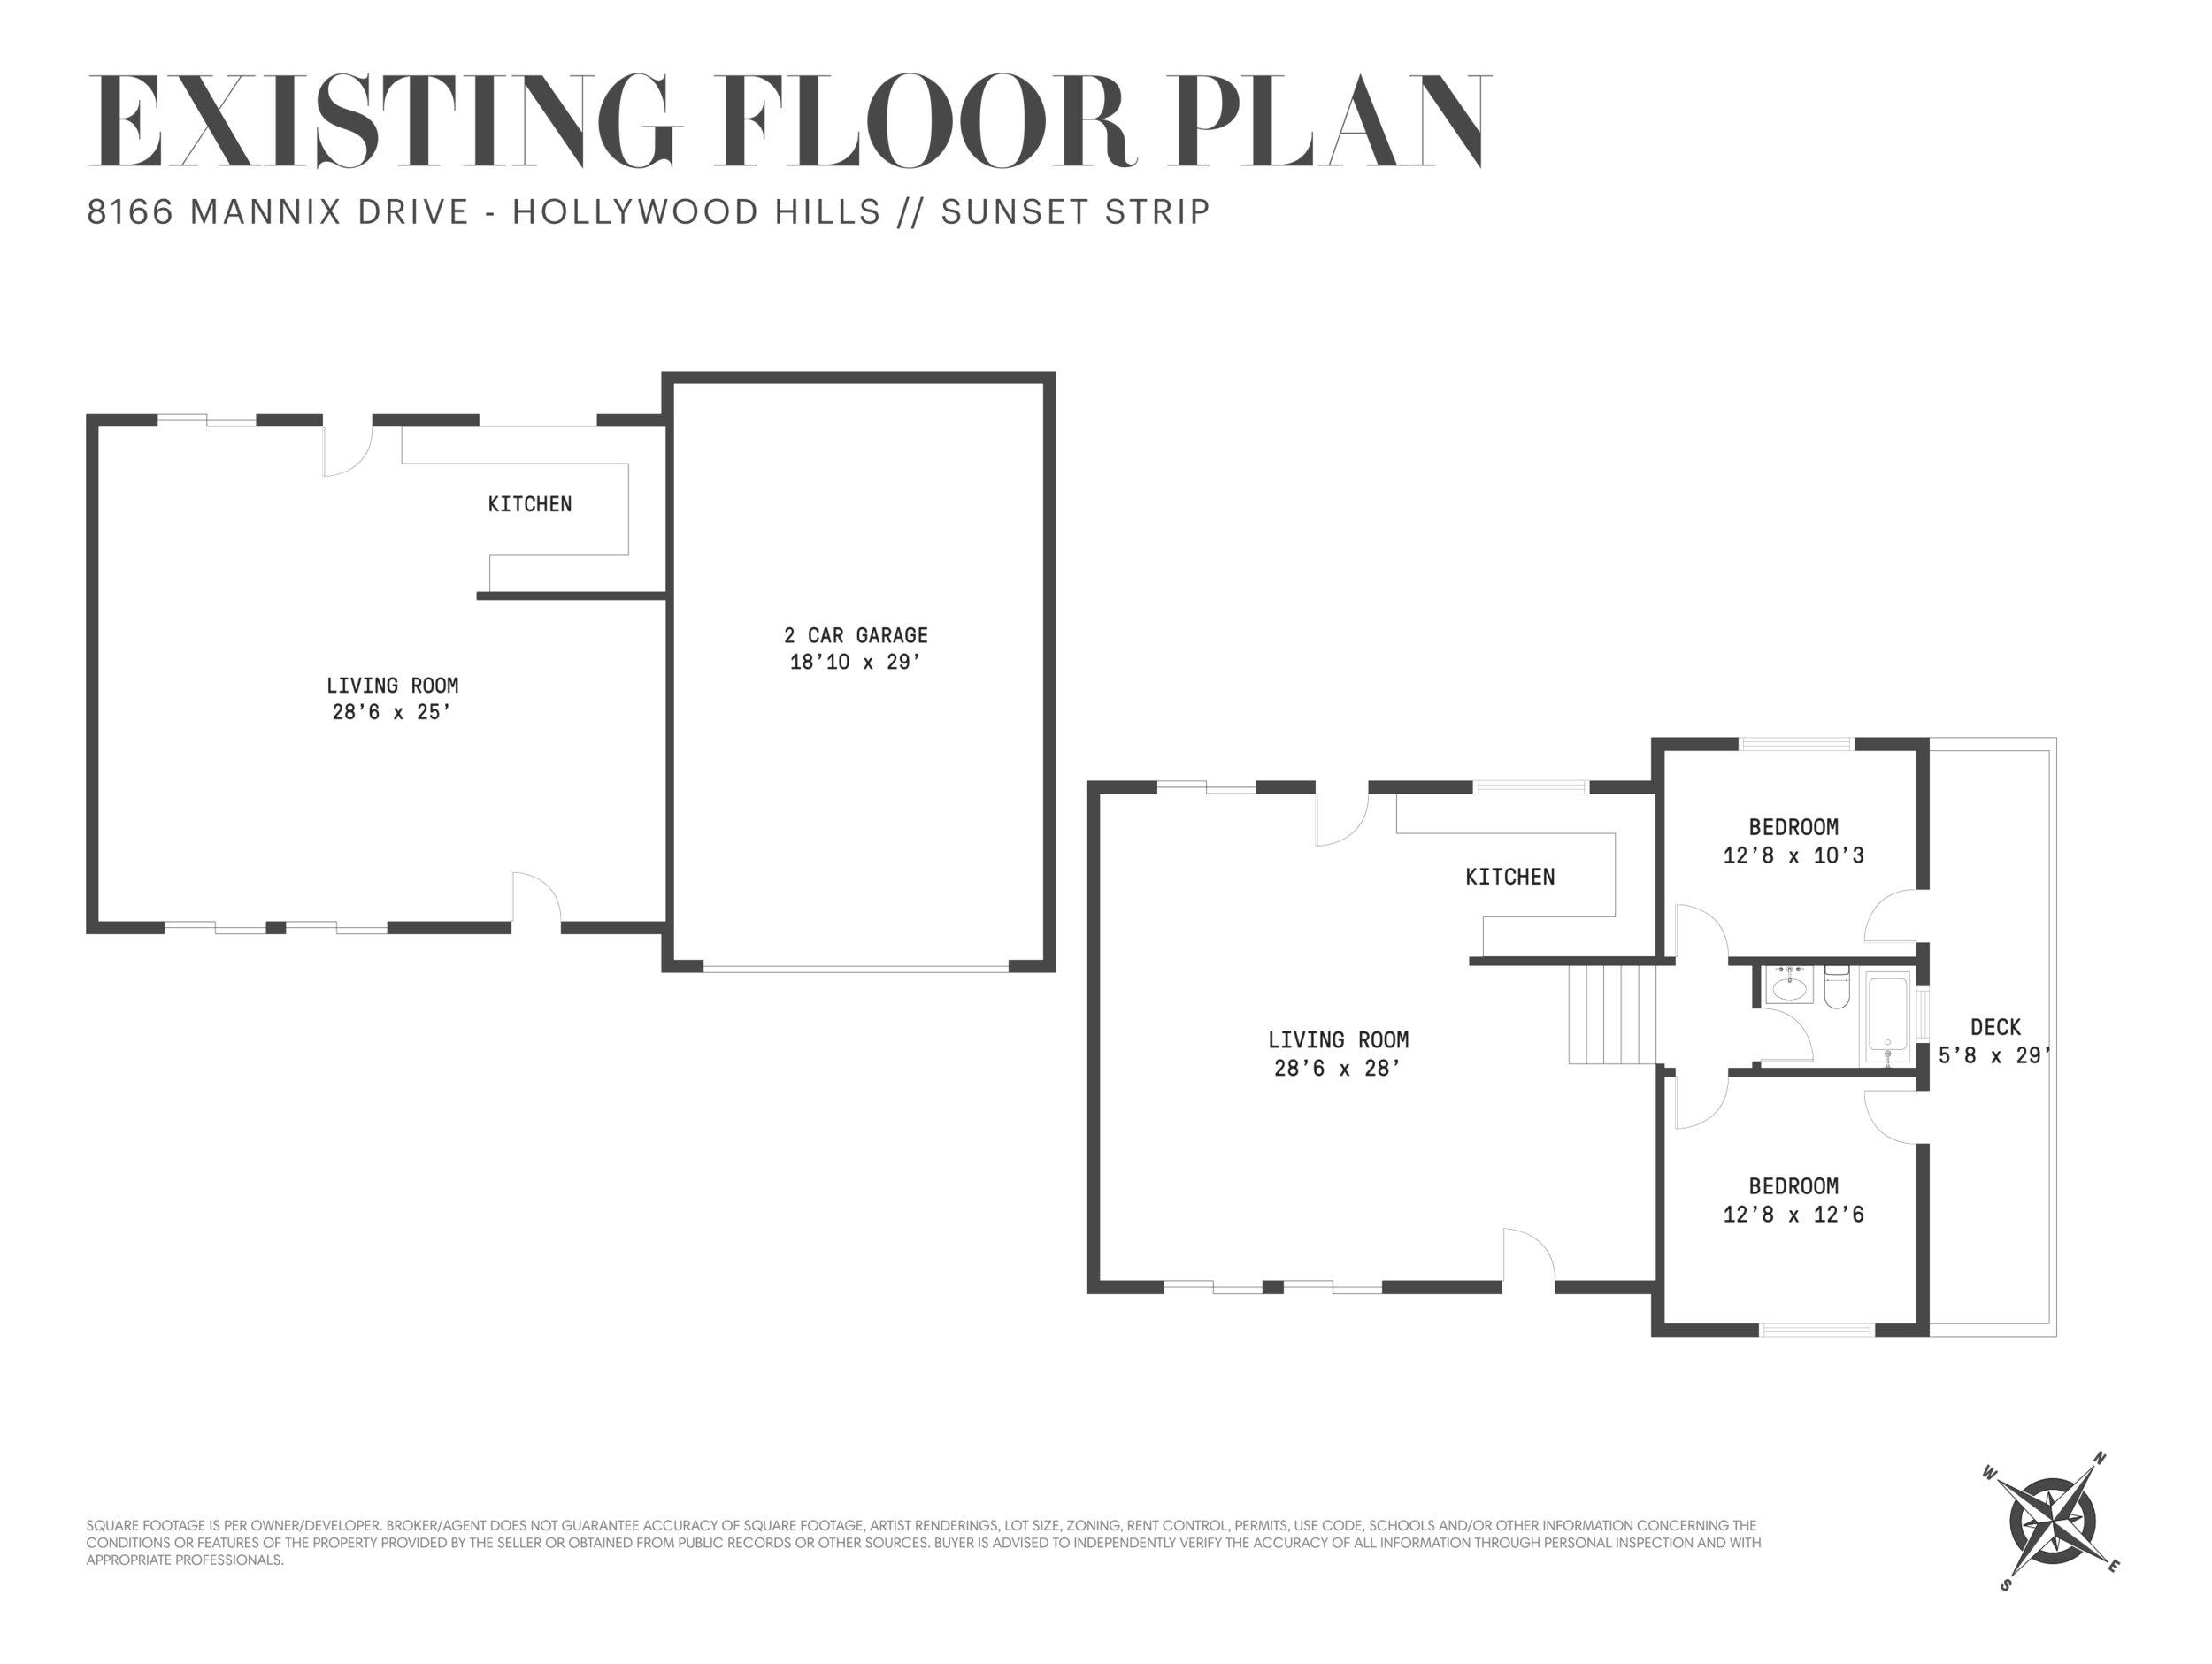 8166-Mannix-Drive - Existing Floor Plan.jpg